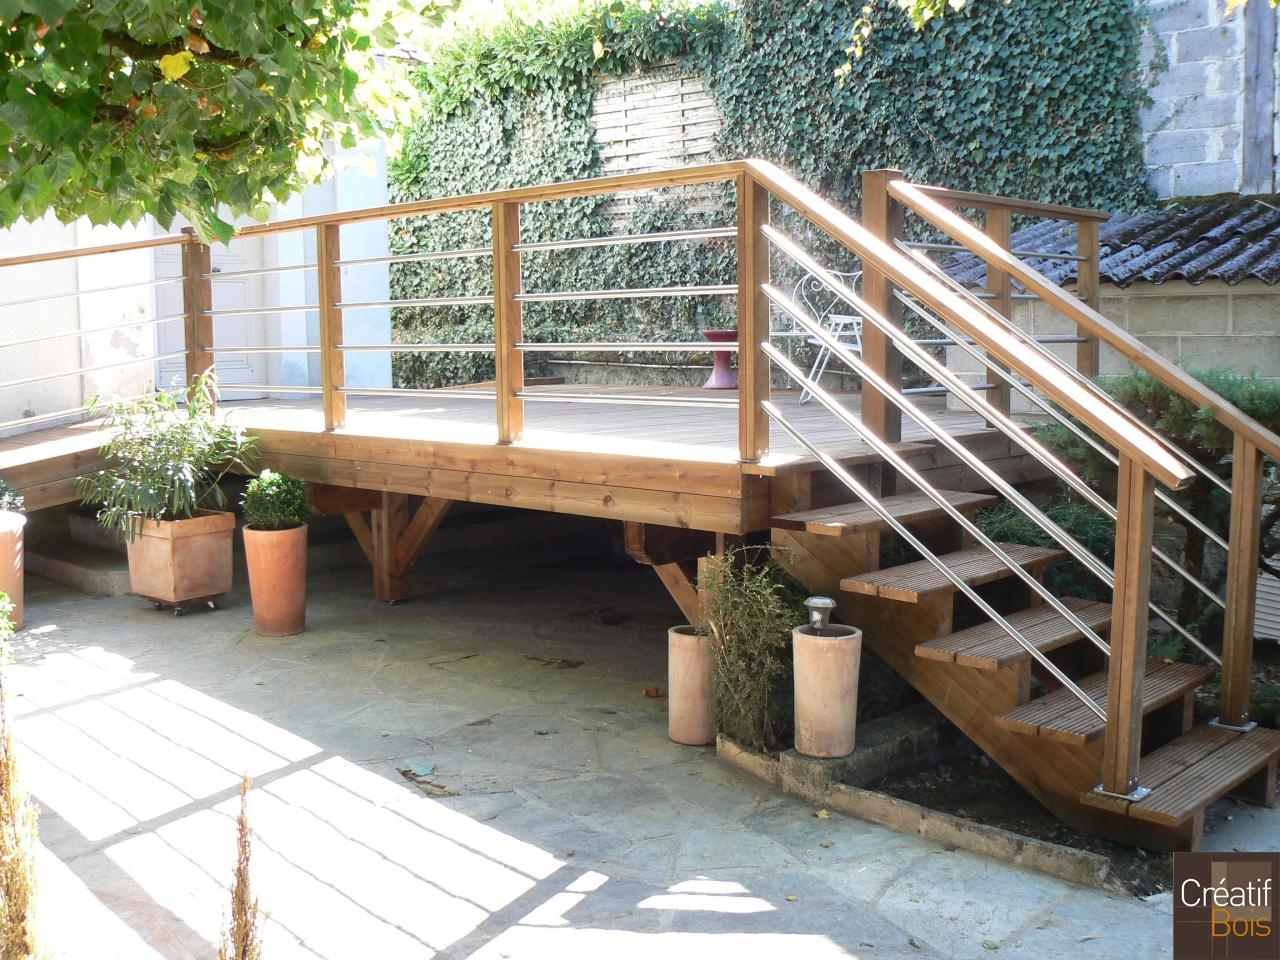 escalier en bois brive la gaillarde corr ze 19. Black Bedroom Furniture Sets. Home Design Ideas